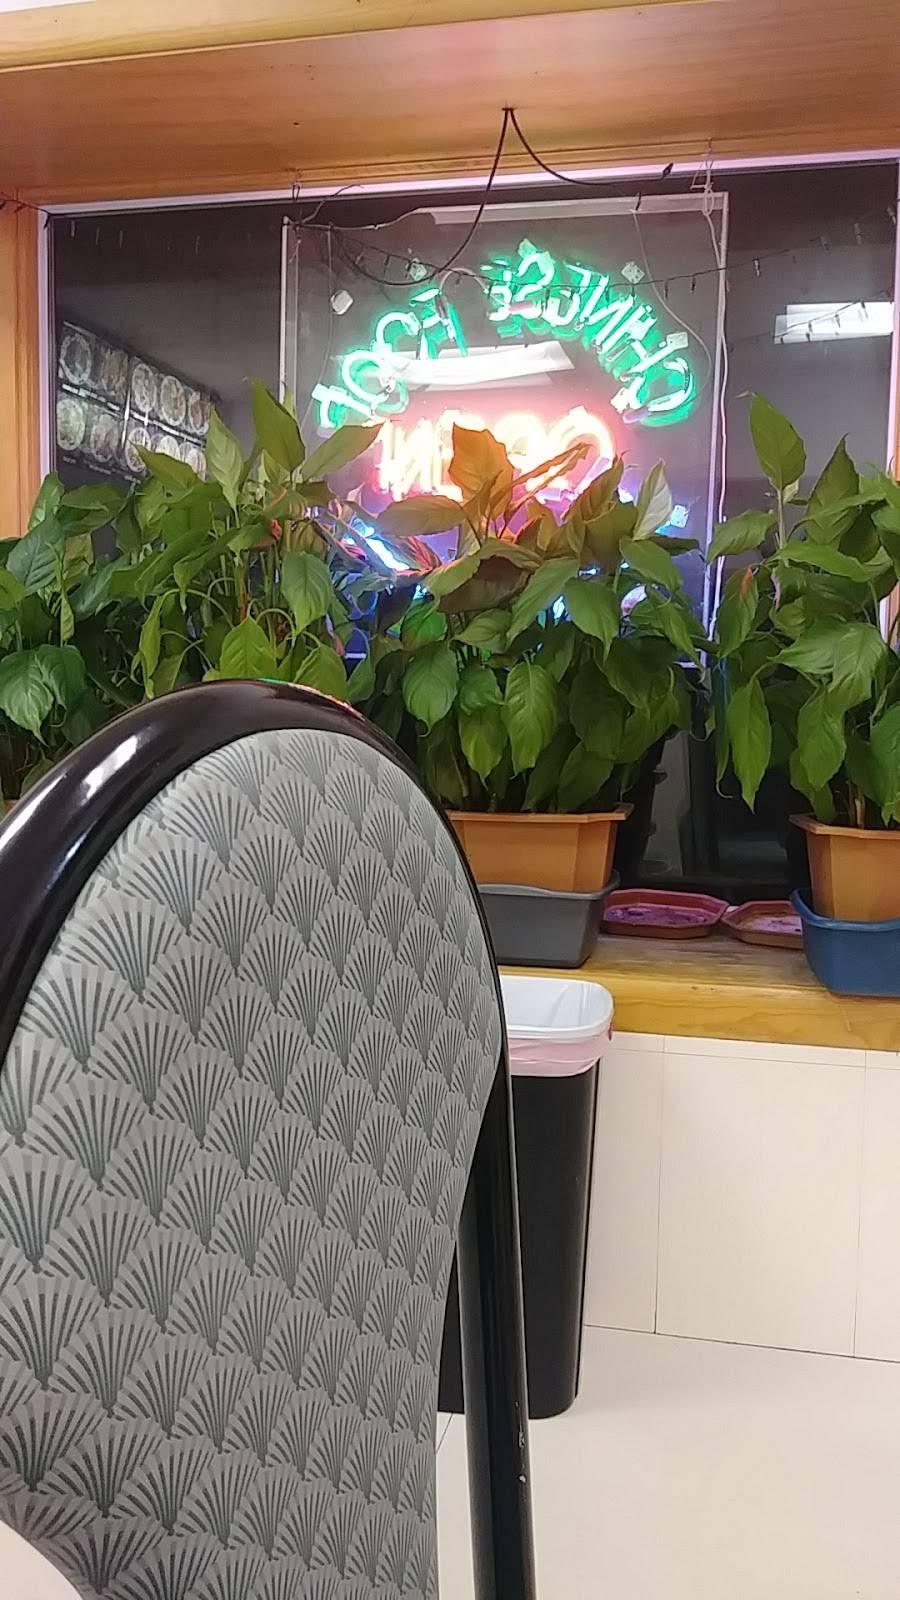 Hunan | restaurant | 430 Teaneck Rd, Ridgefield Park, NJ 07660, USA | 2013731888 OR +1 201-373-1888